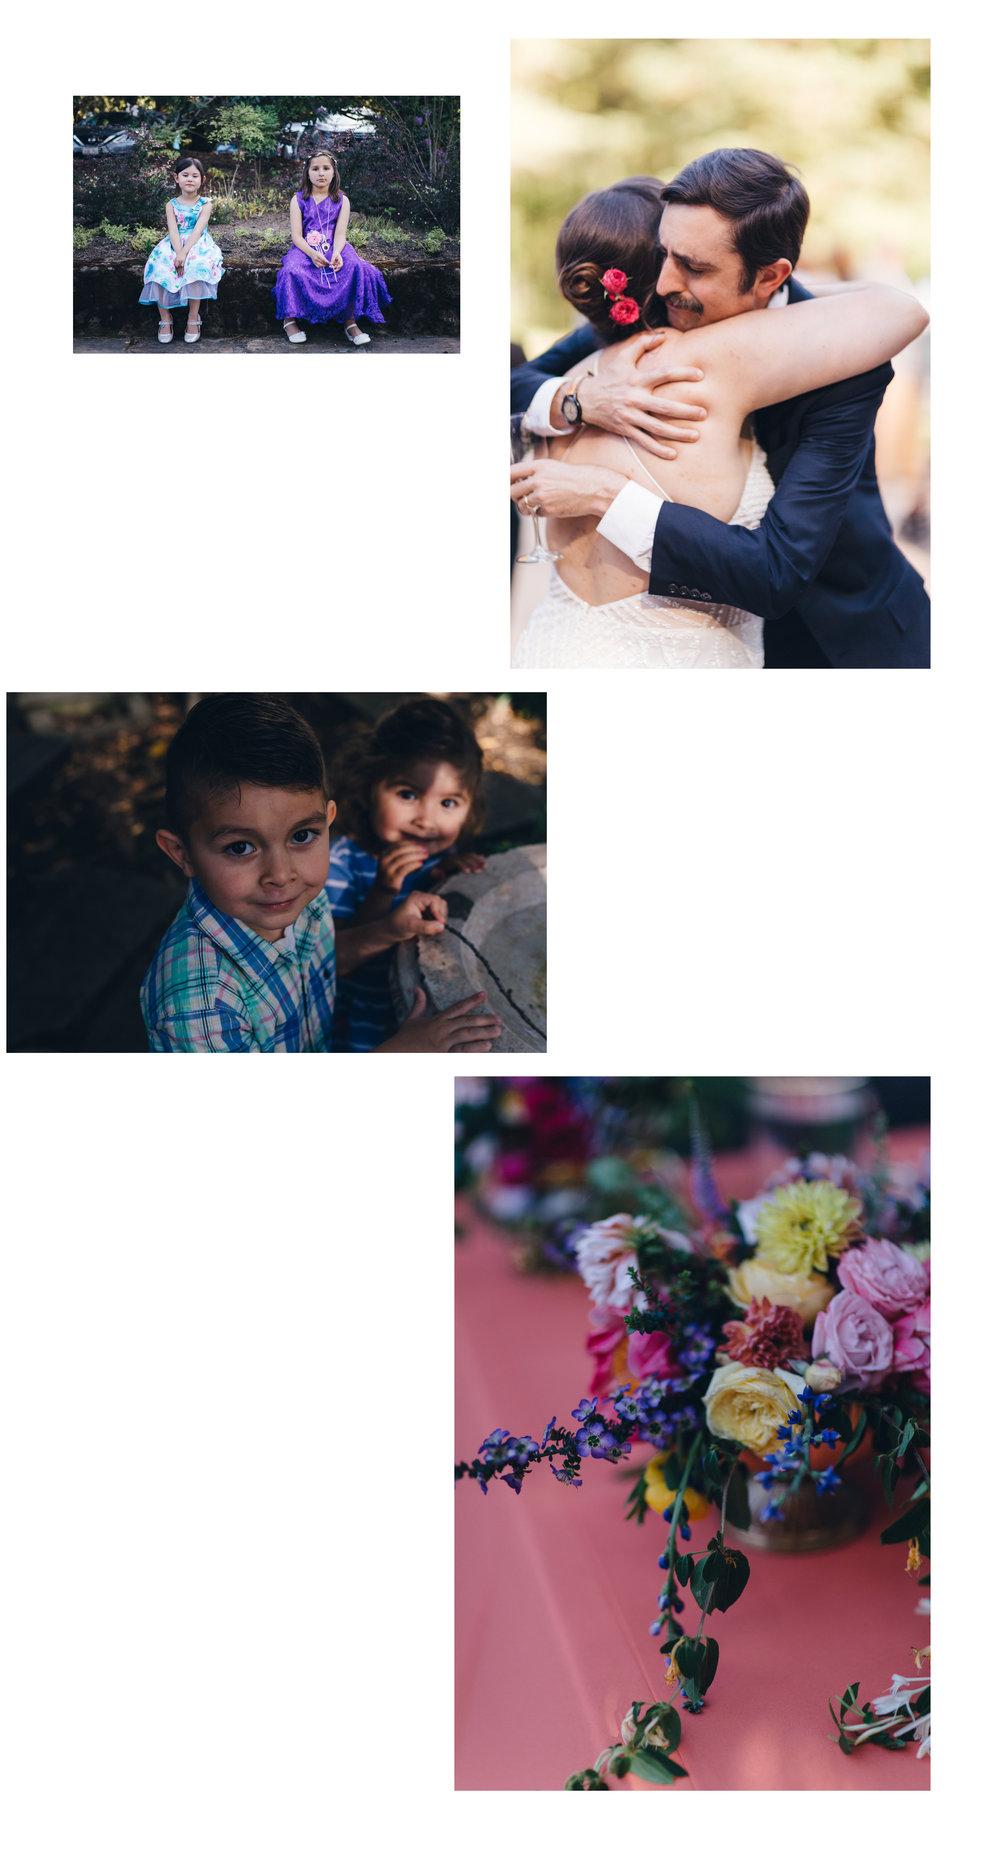 IG_wedding (30 of 110) copy2.jpg